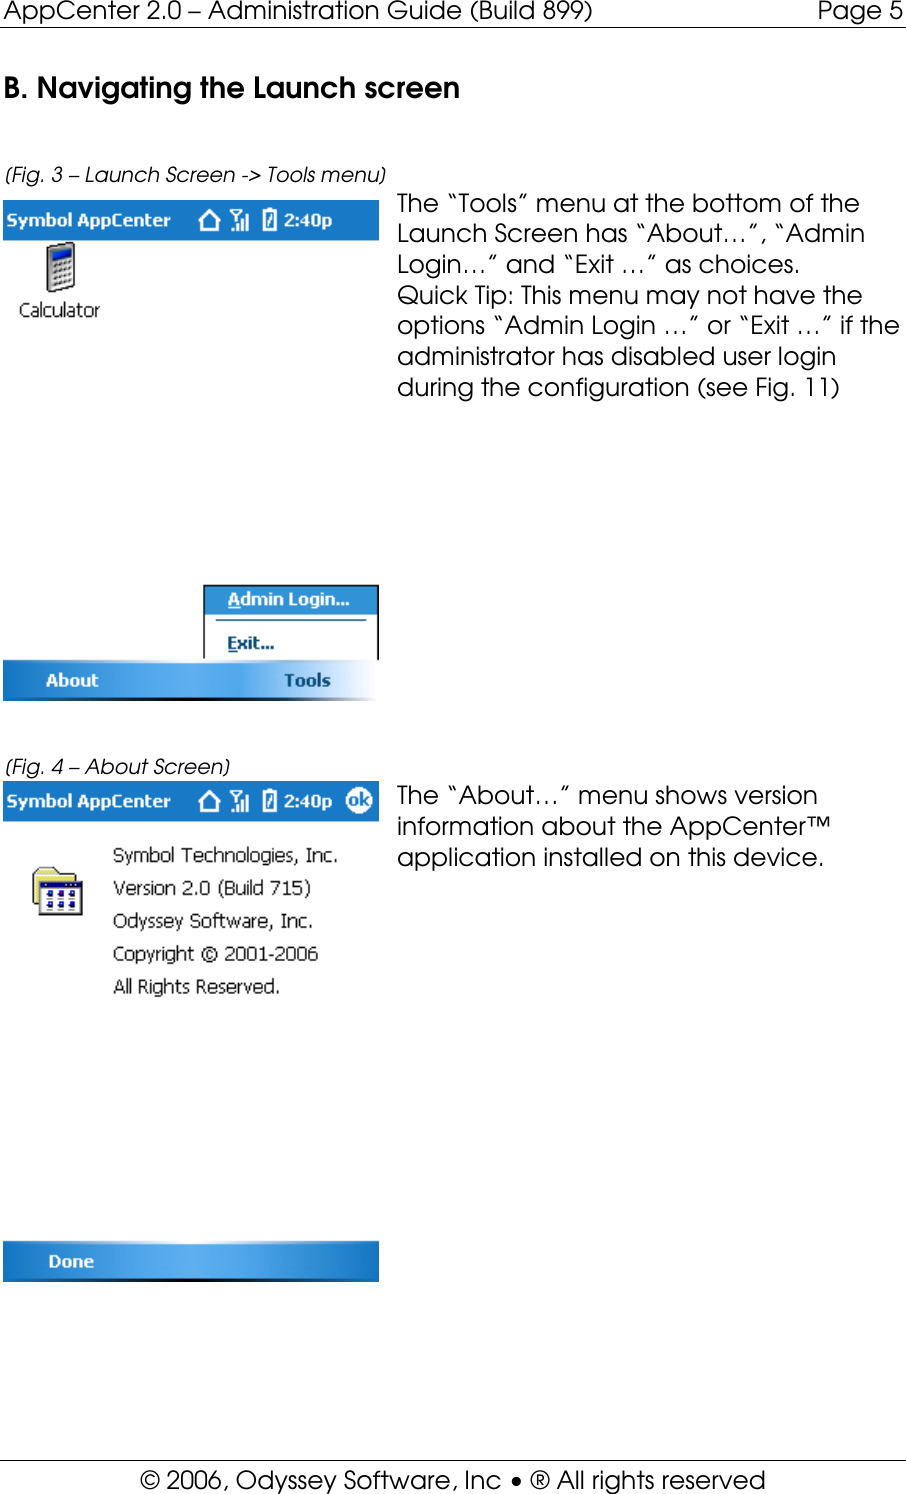 AppCenter 2 0 WM Admin Guide Build 899 App Center